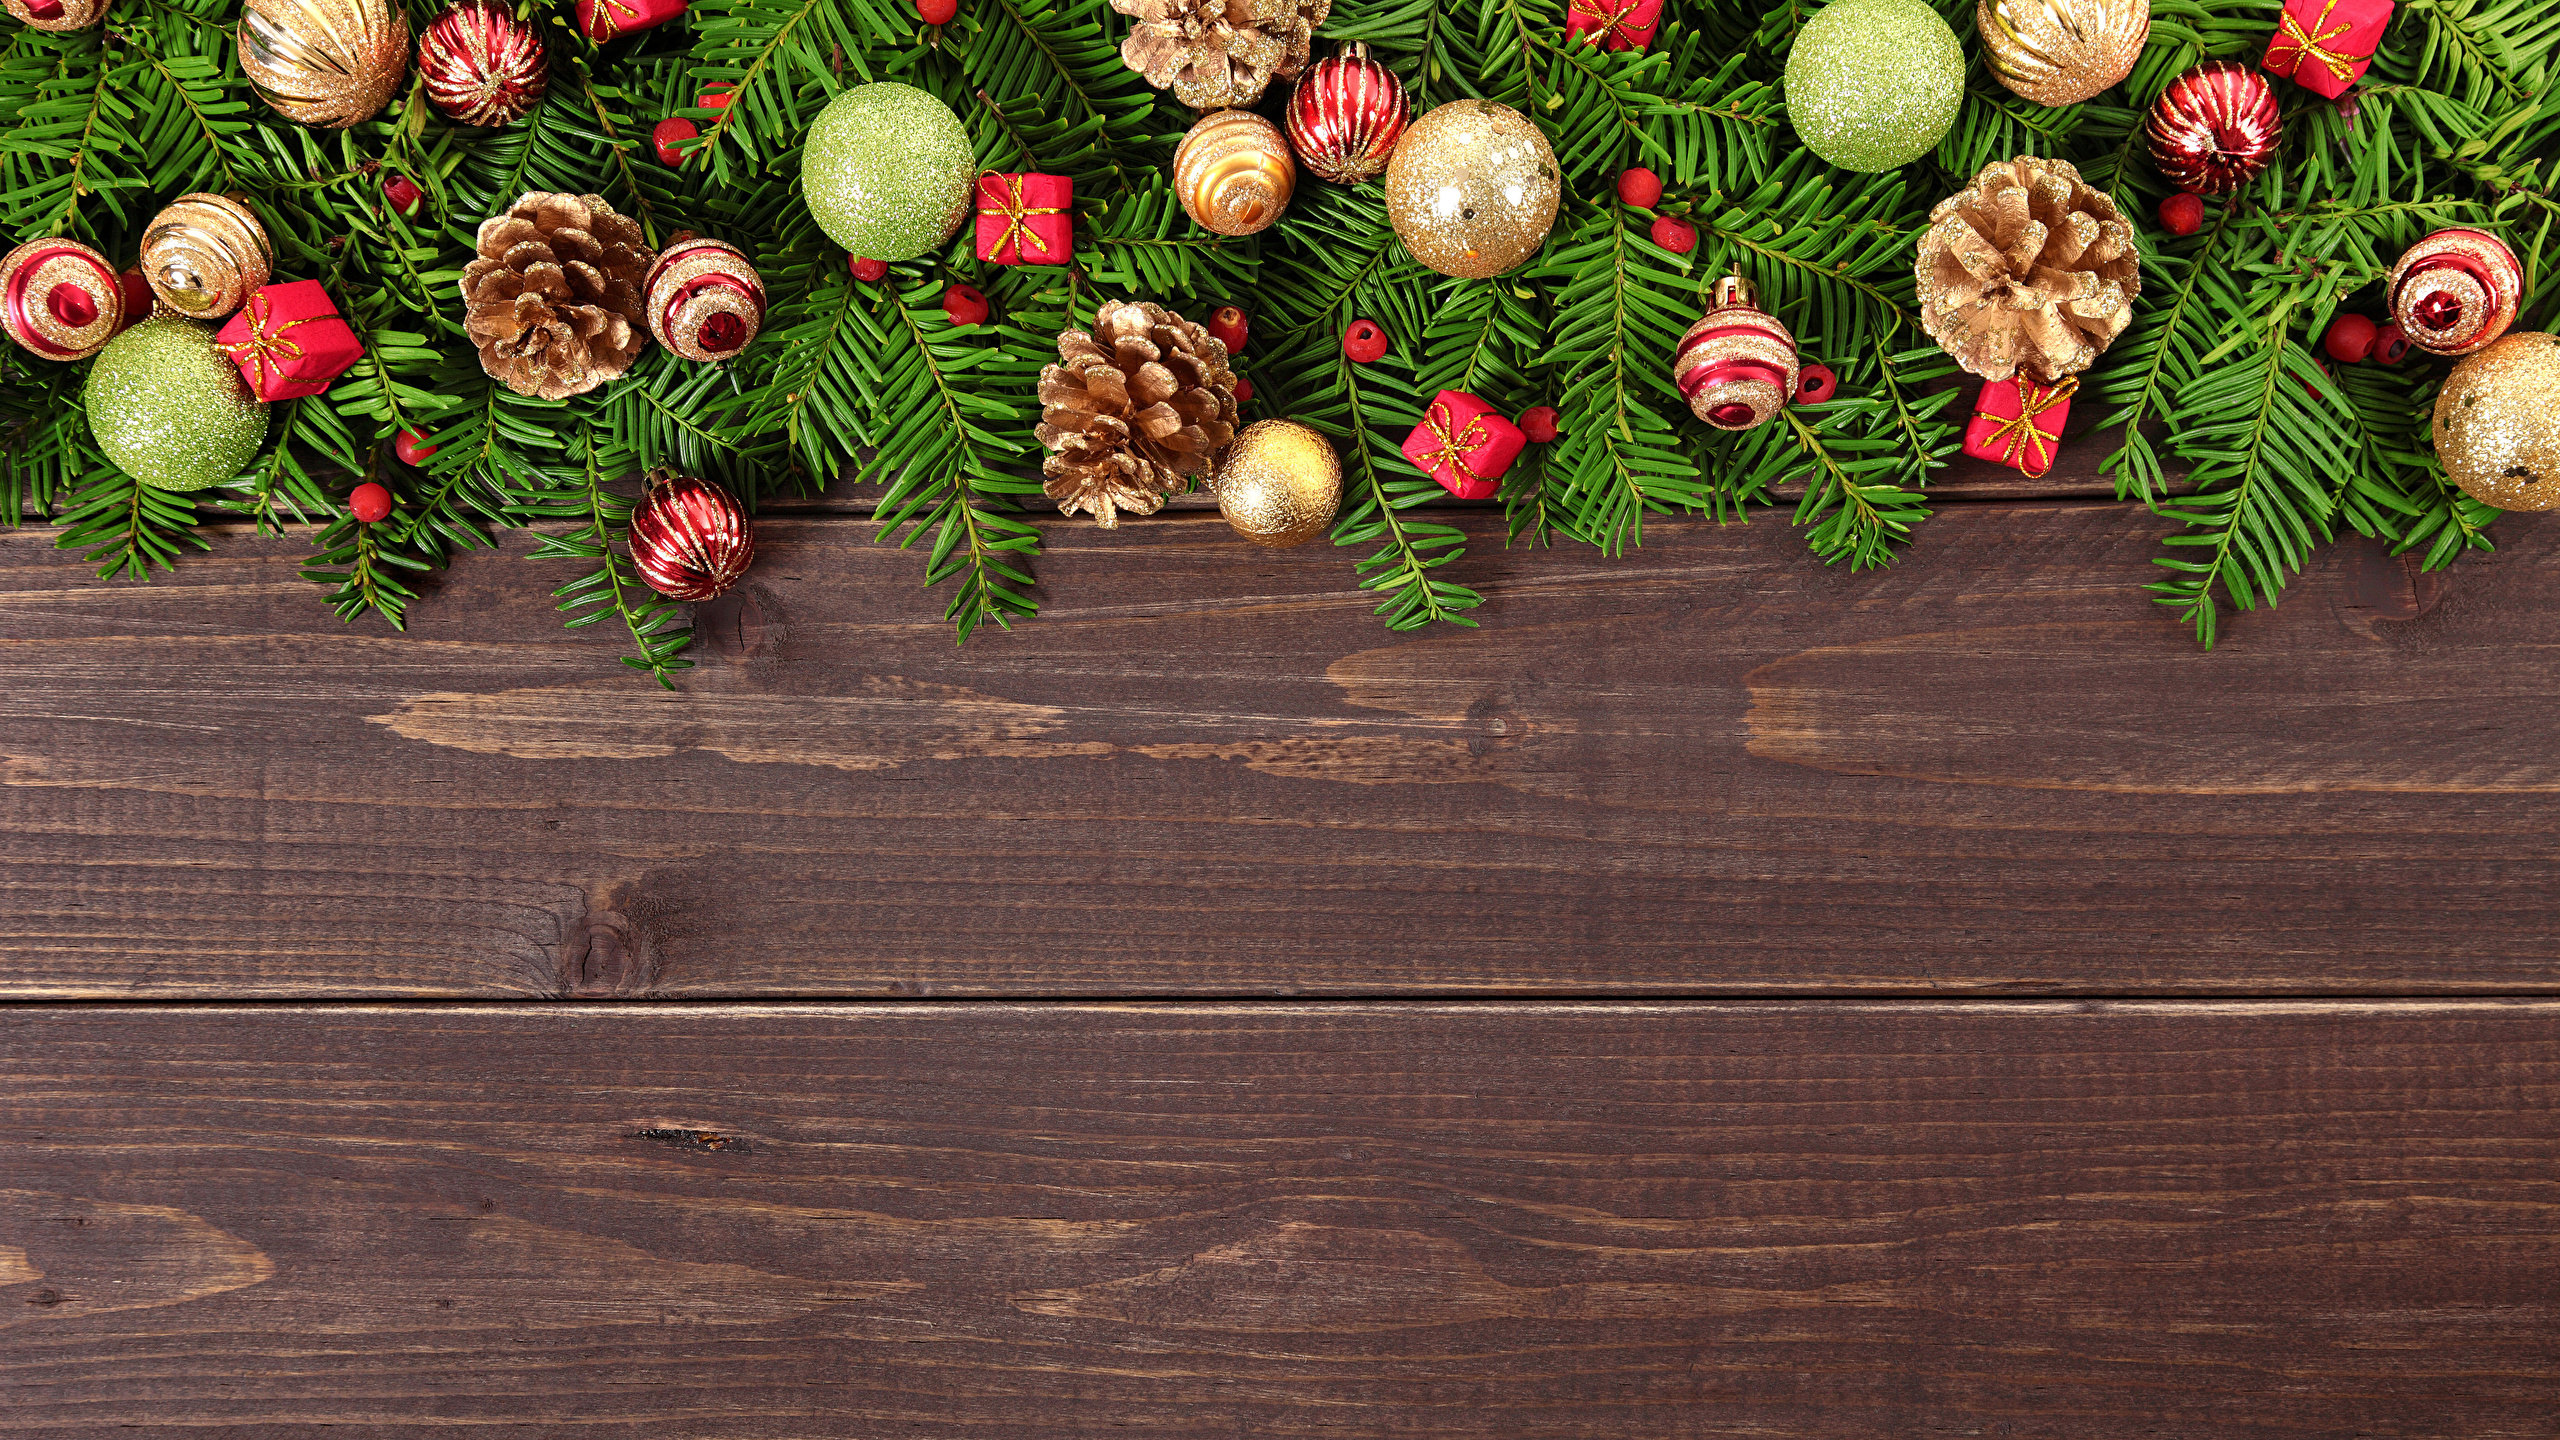 Картинка Рождество Шар шишка Доски 2560x1440 Новый год Шишки Шарики